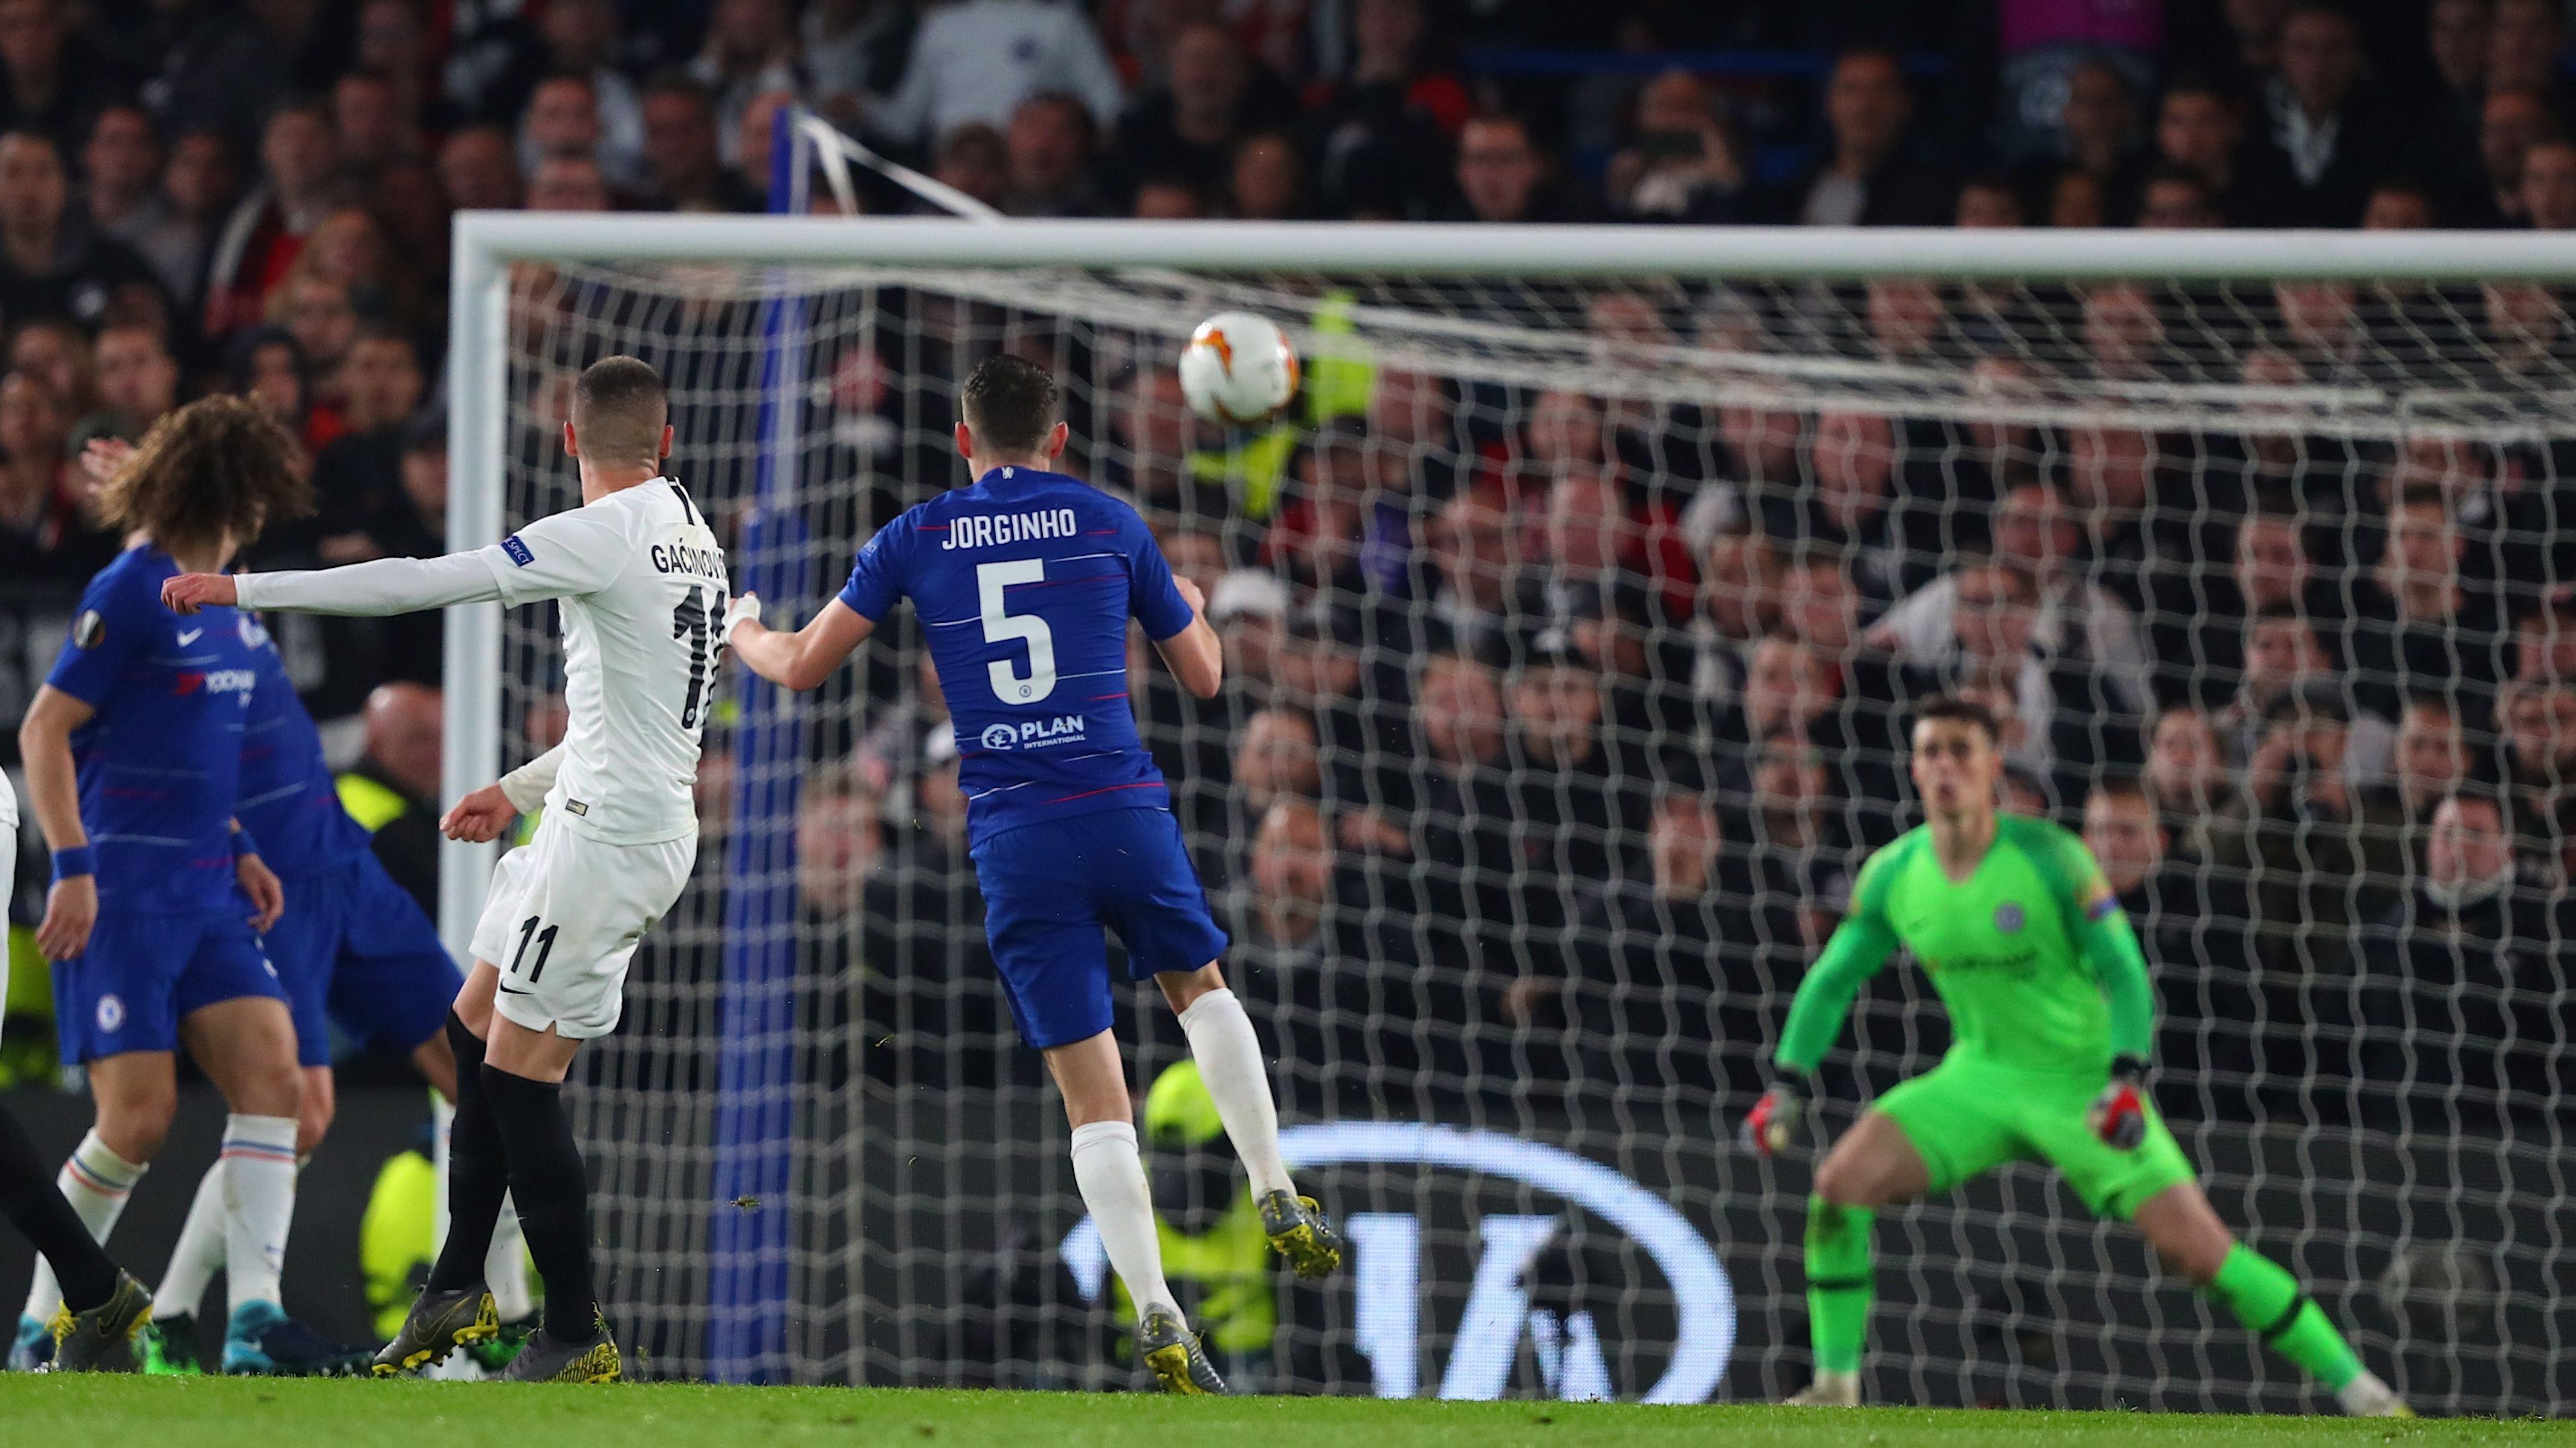 Frankfurt kommt nach 1:1 bei Chelsea ins Finale der Euroleague